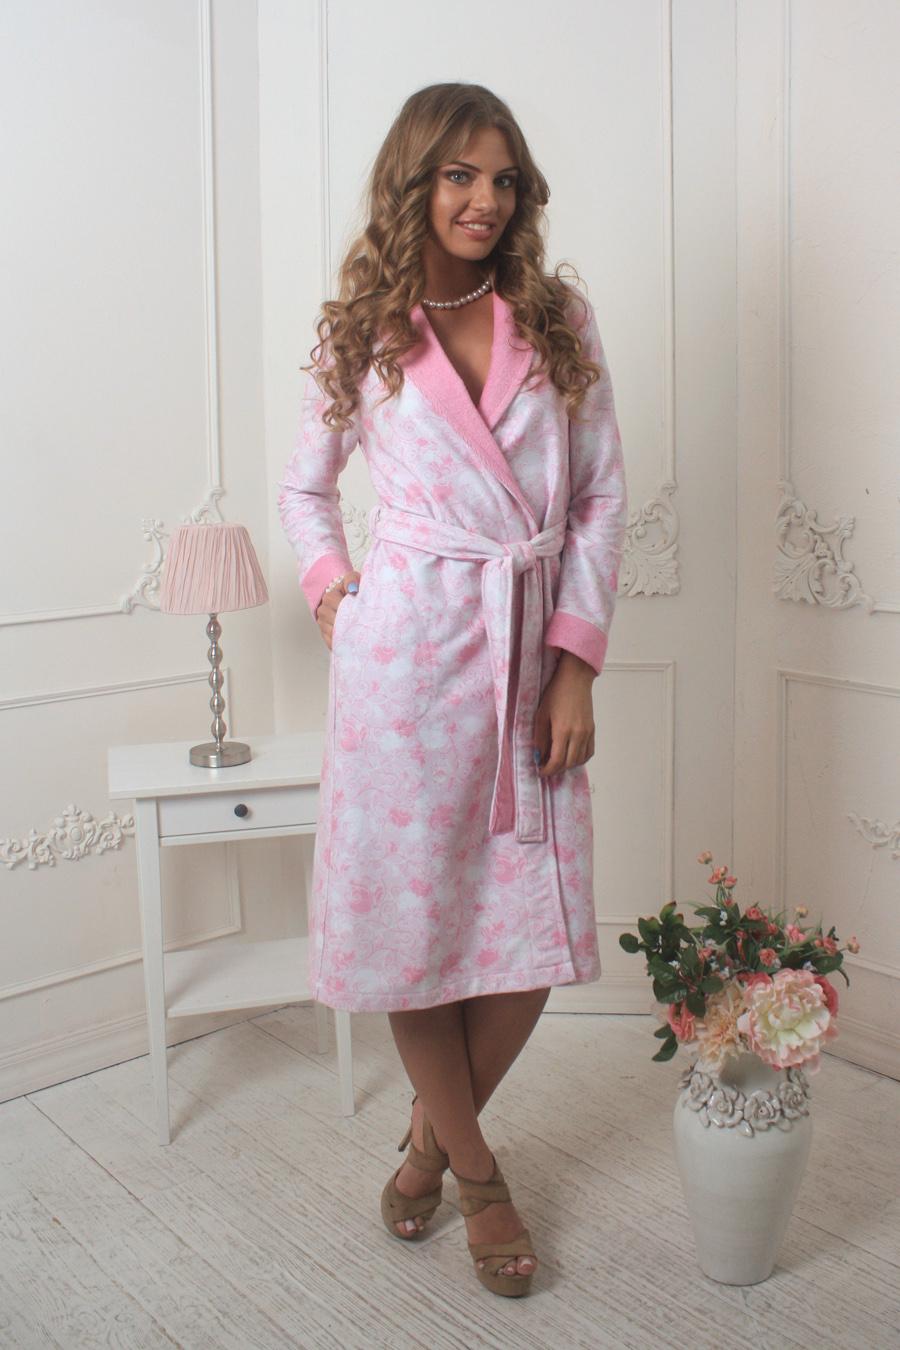 Халат женский Five Wien Home Liana, цвет: розовый, белый. 452. Размер XXL (52/54) платье liana